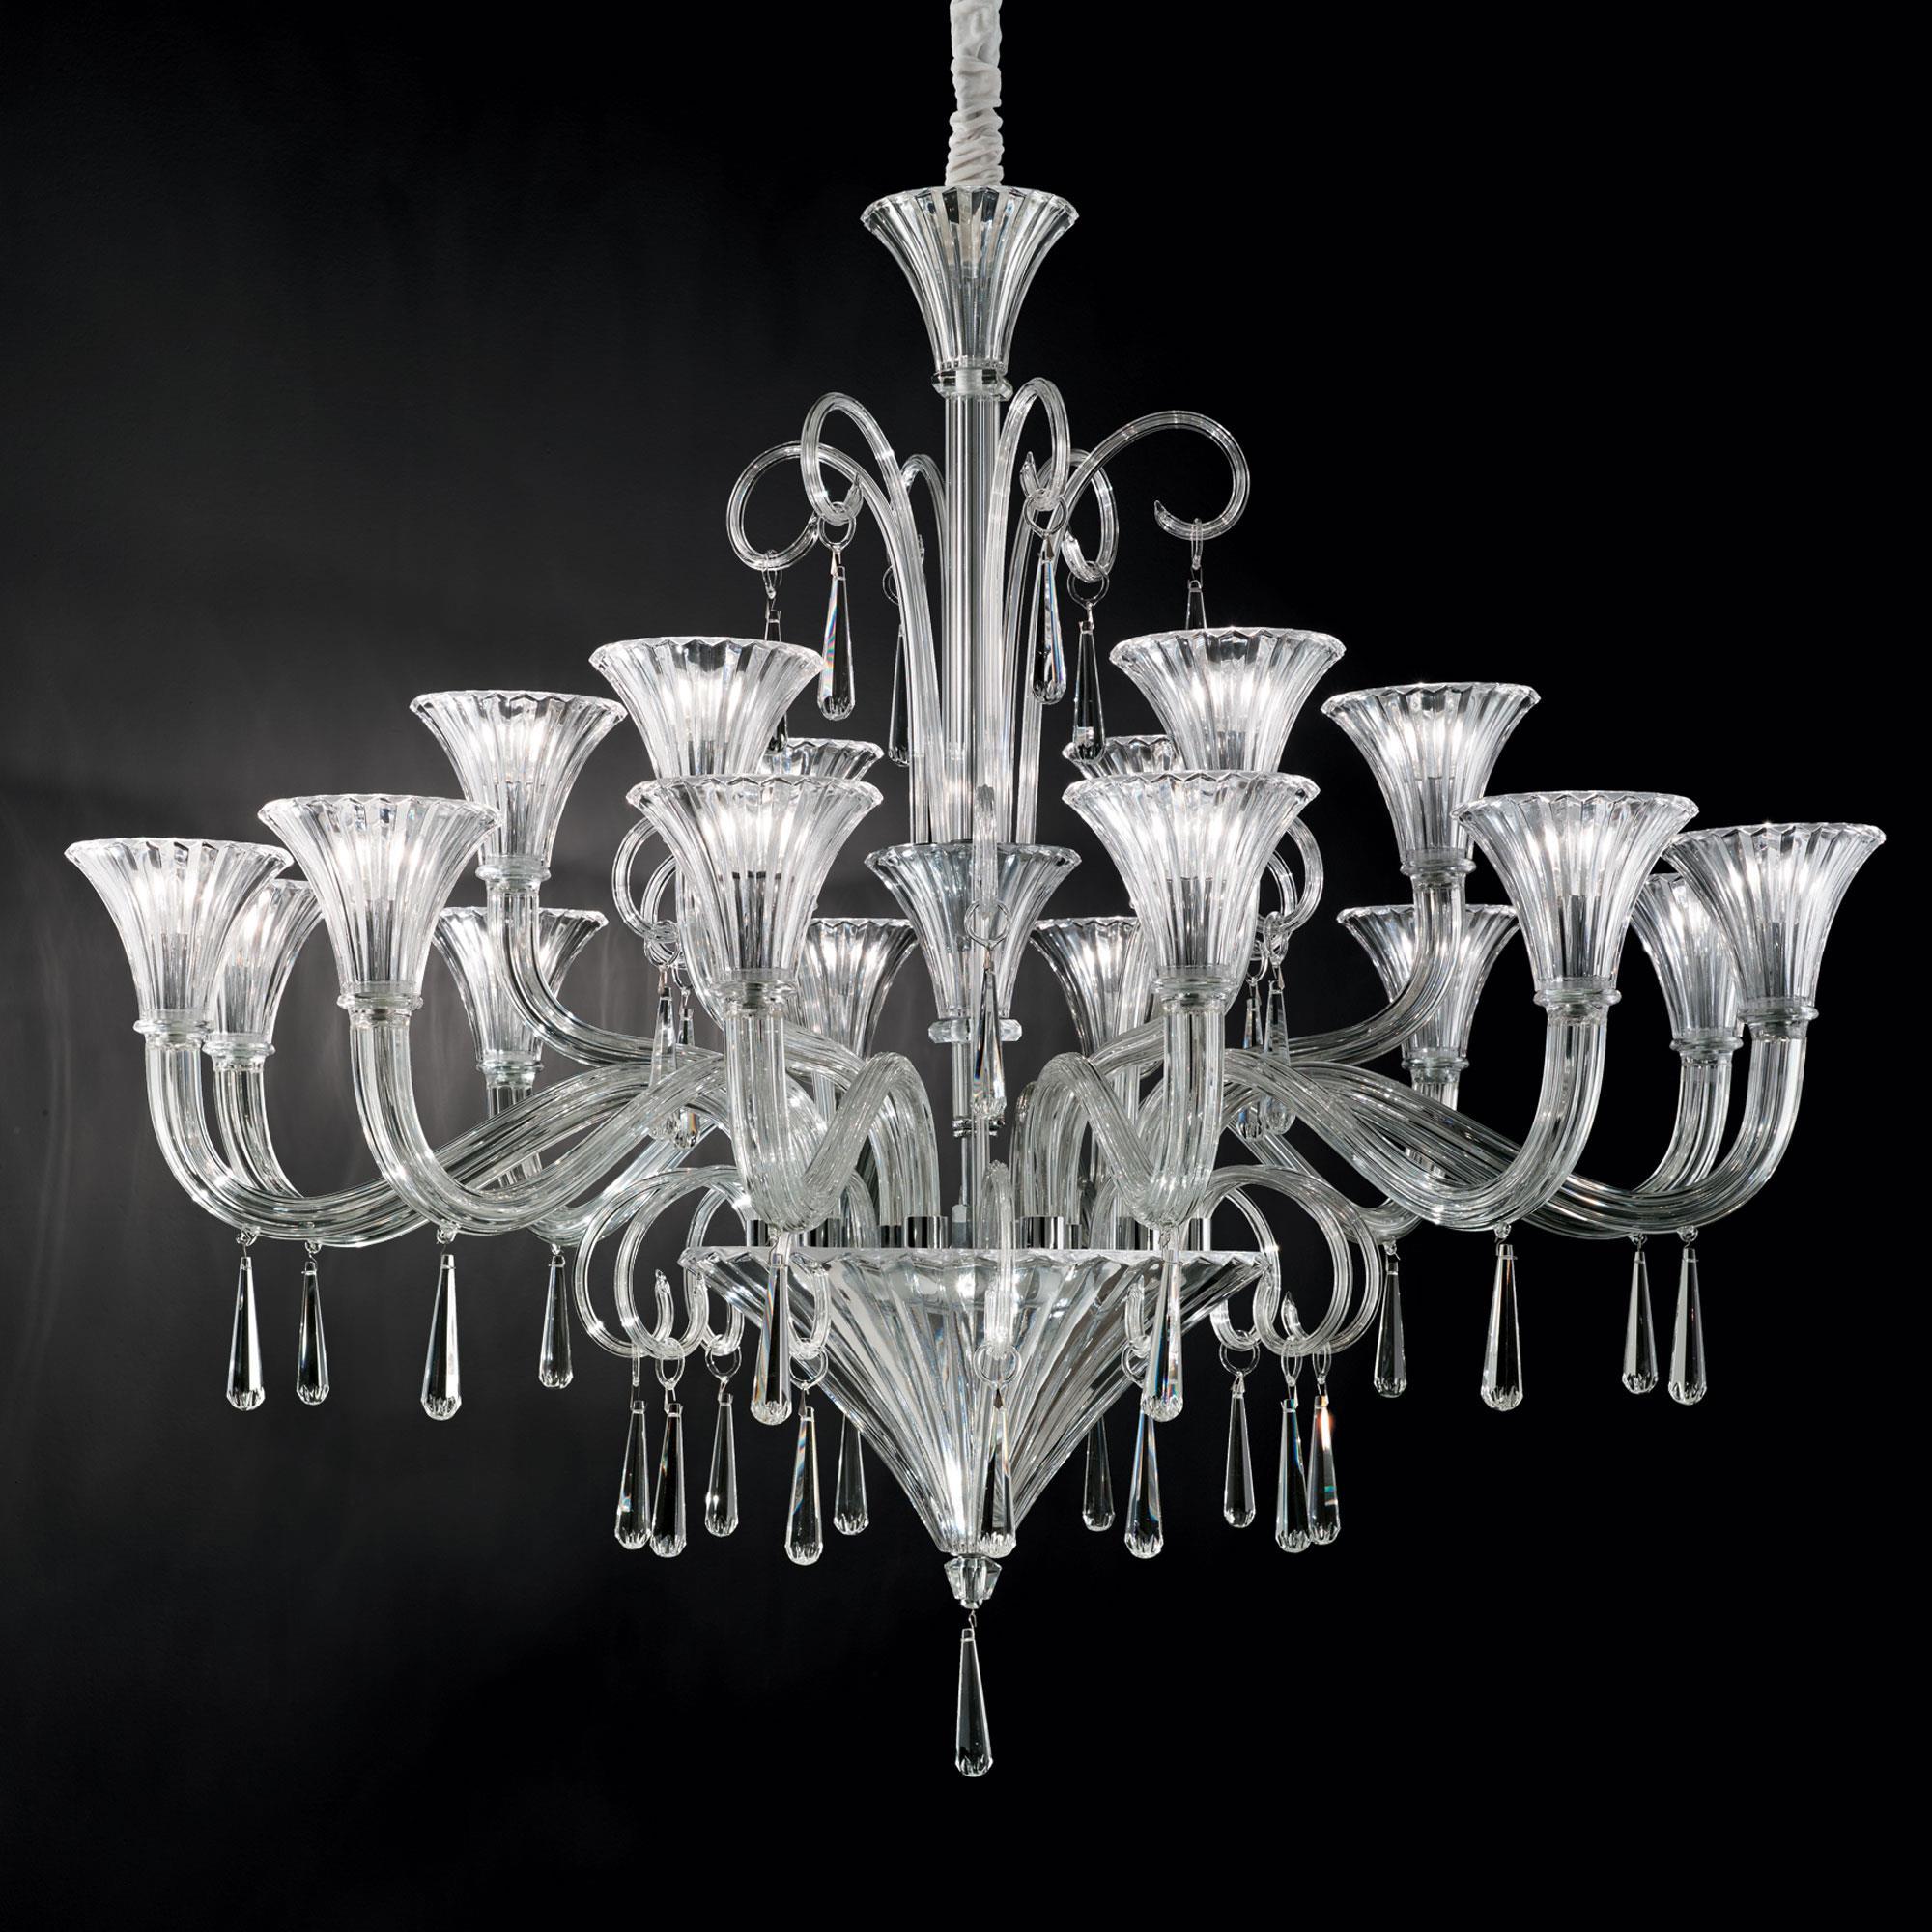 Ideal Lux 142227 Santa SP18 csillár lámpa